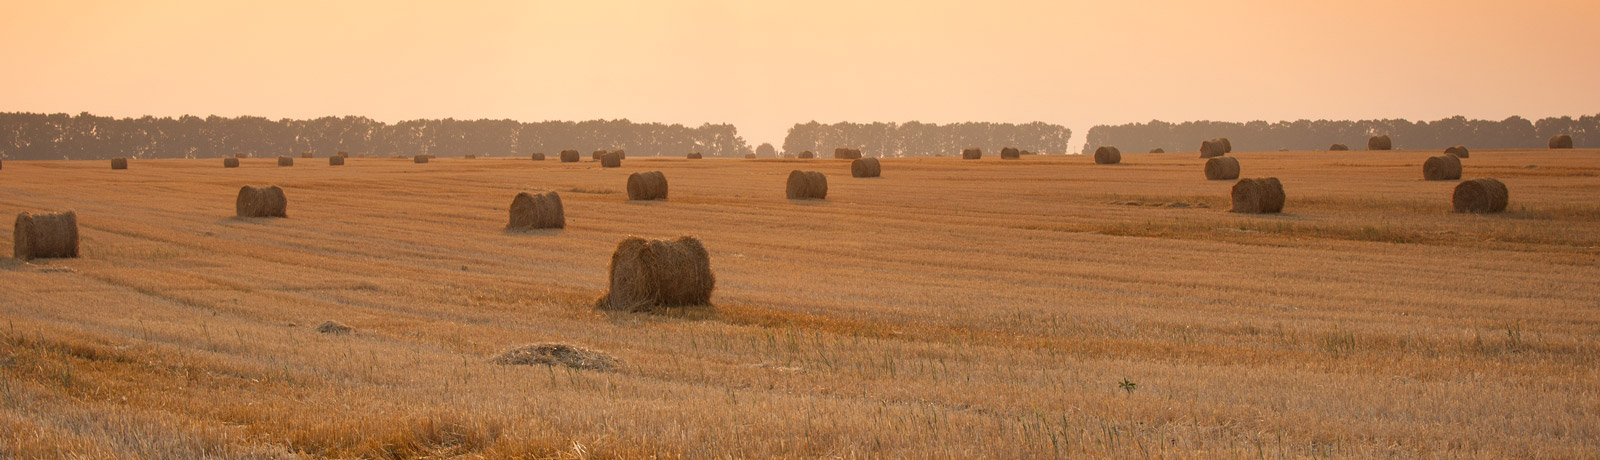 round bales scattered around a field